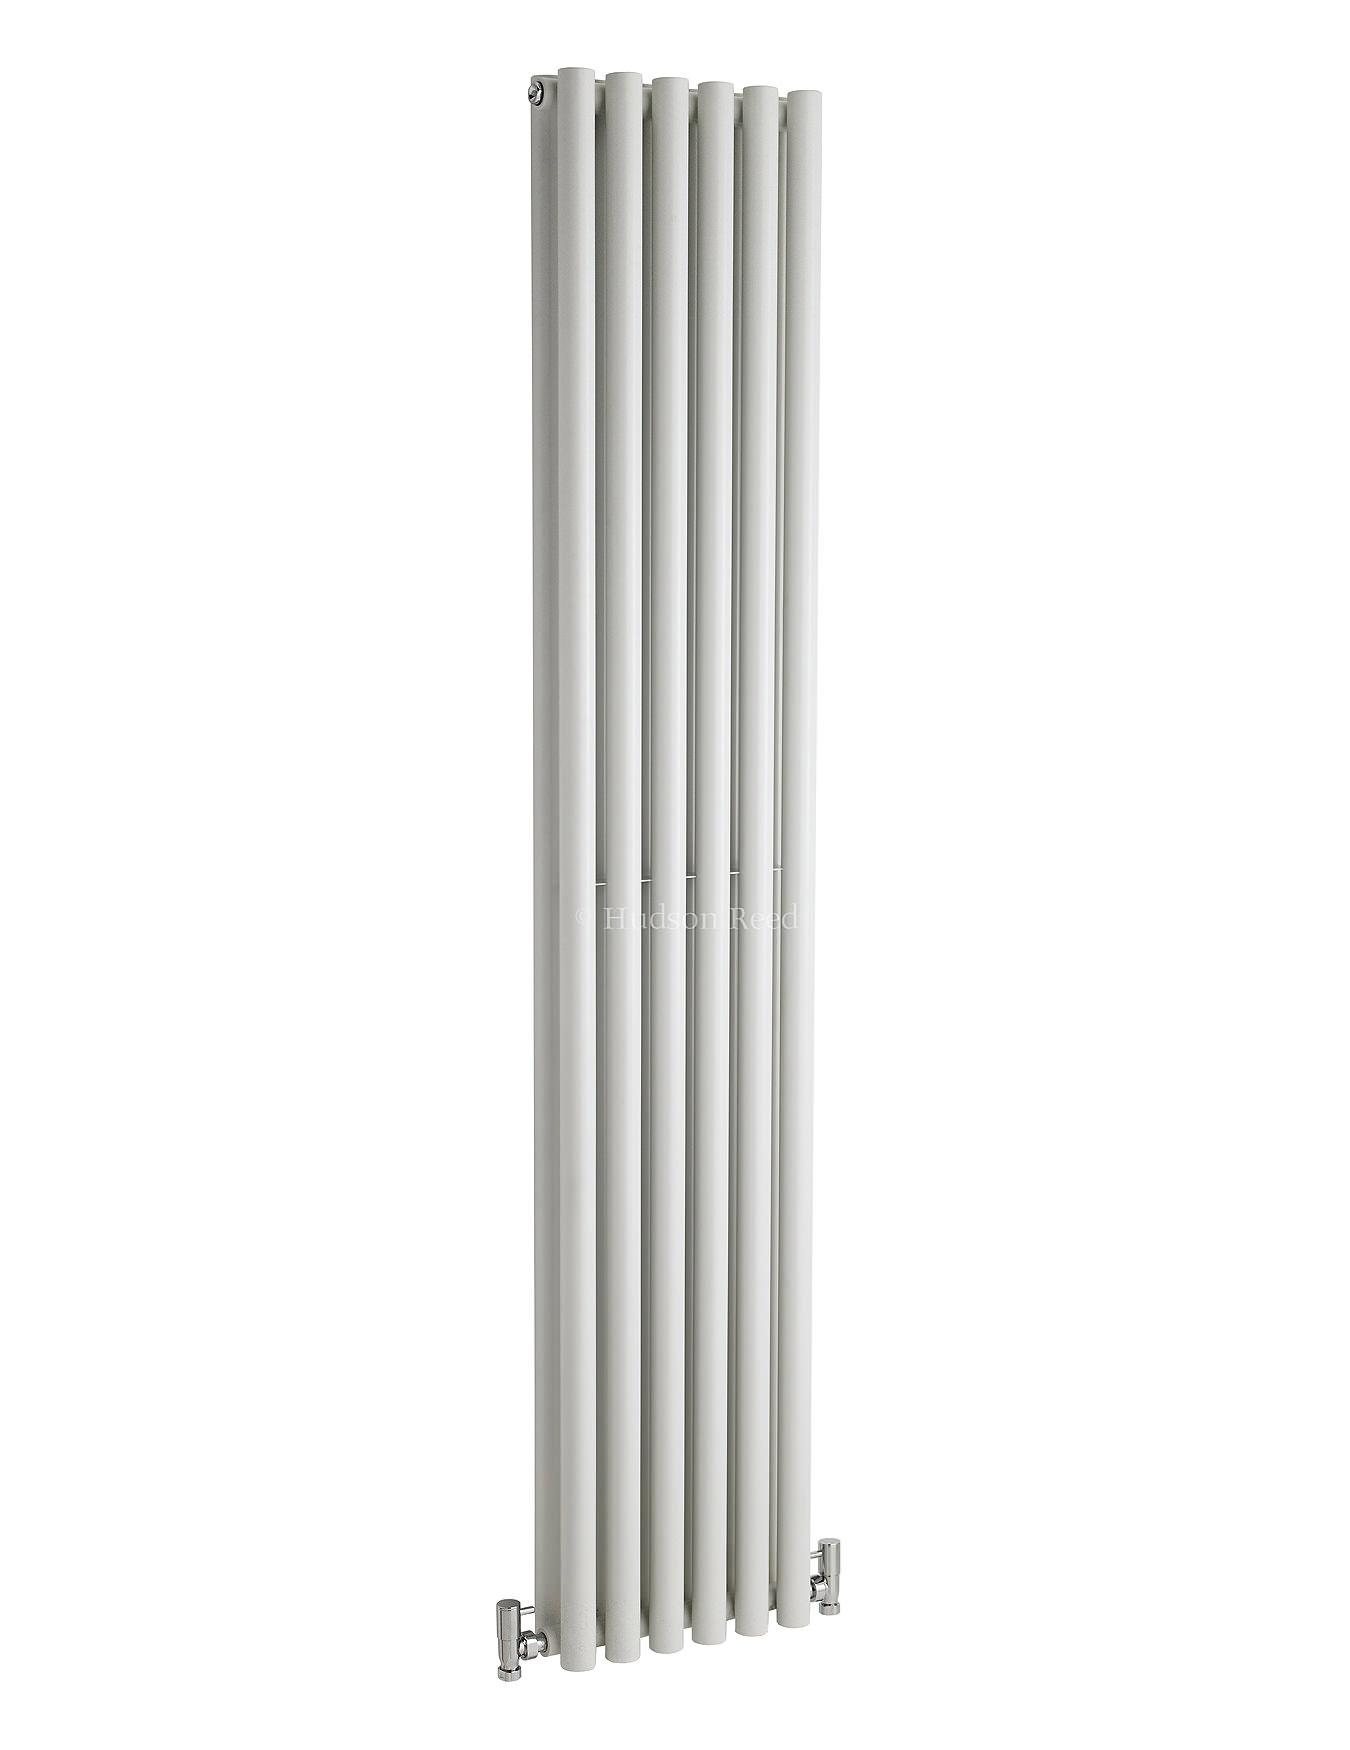 hudson reed savy double panel white radiator 354x1800mm. Black Bedroom Furniture Sets. Home Design Ideas